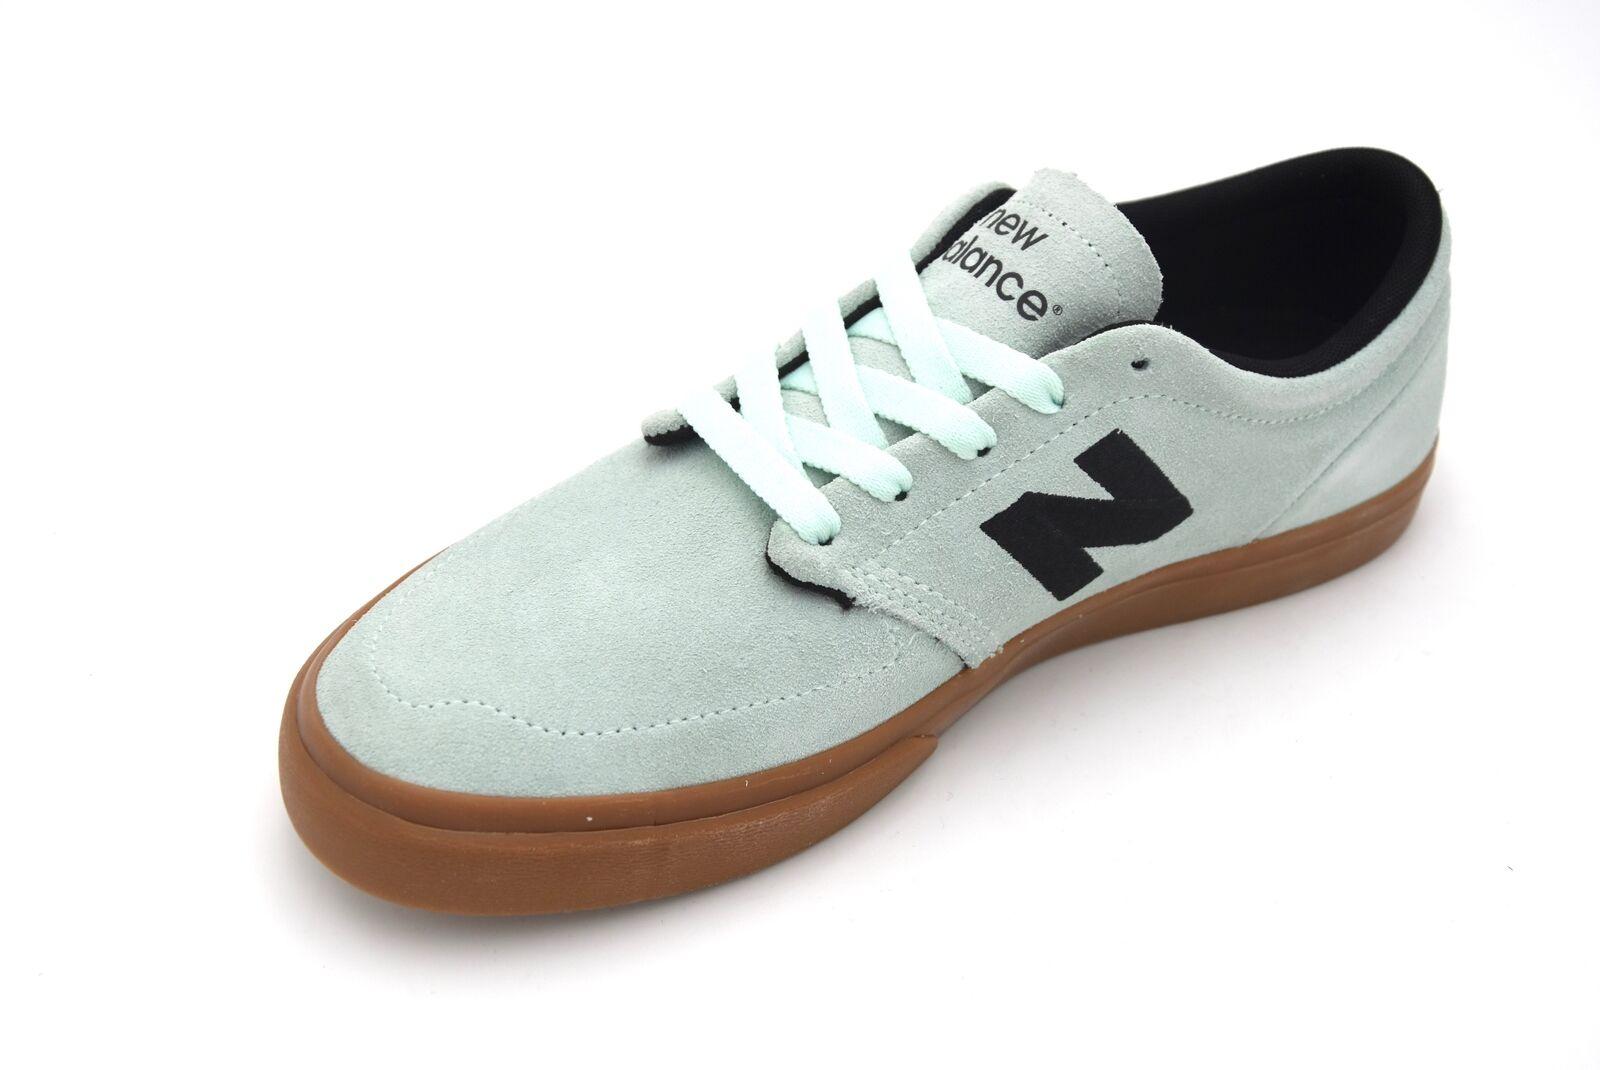 Balance Qtrwwe5 Caballero De New Zapatillas Casuales xvnRUB